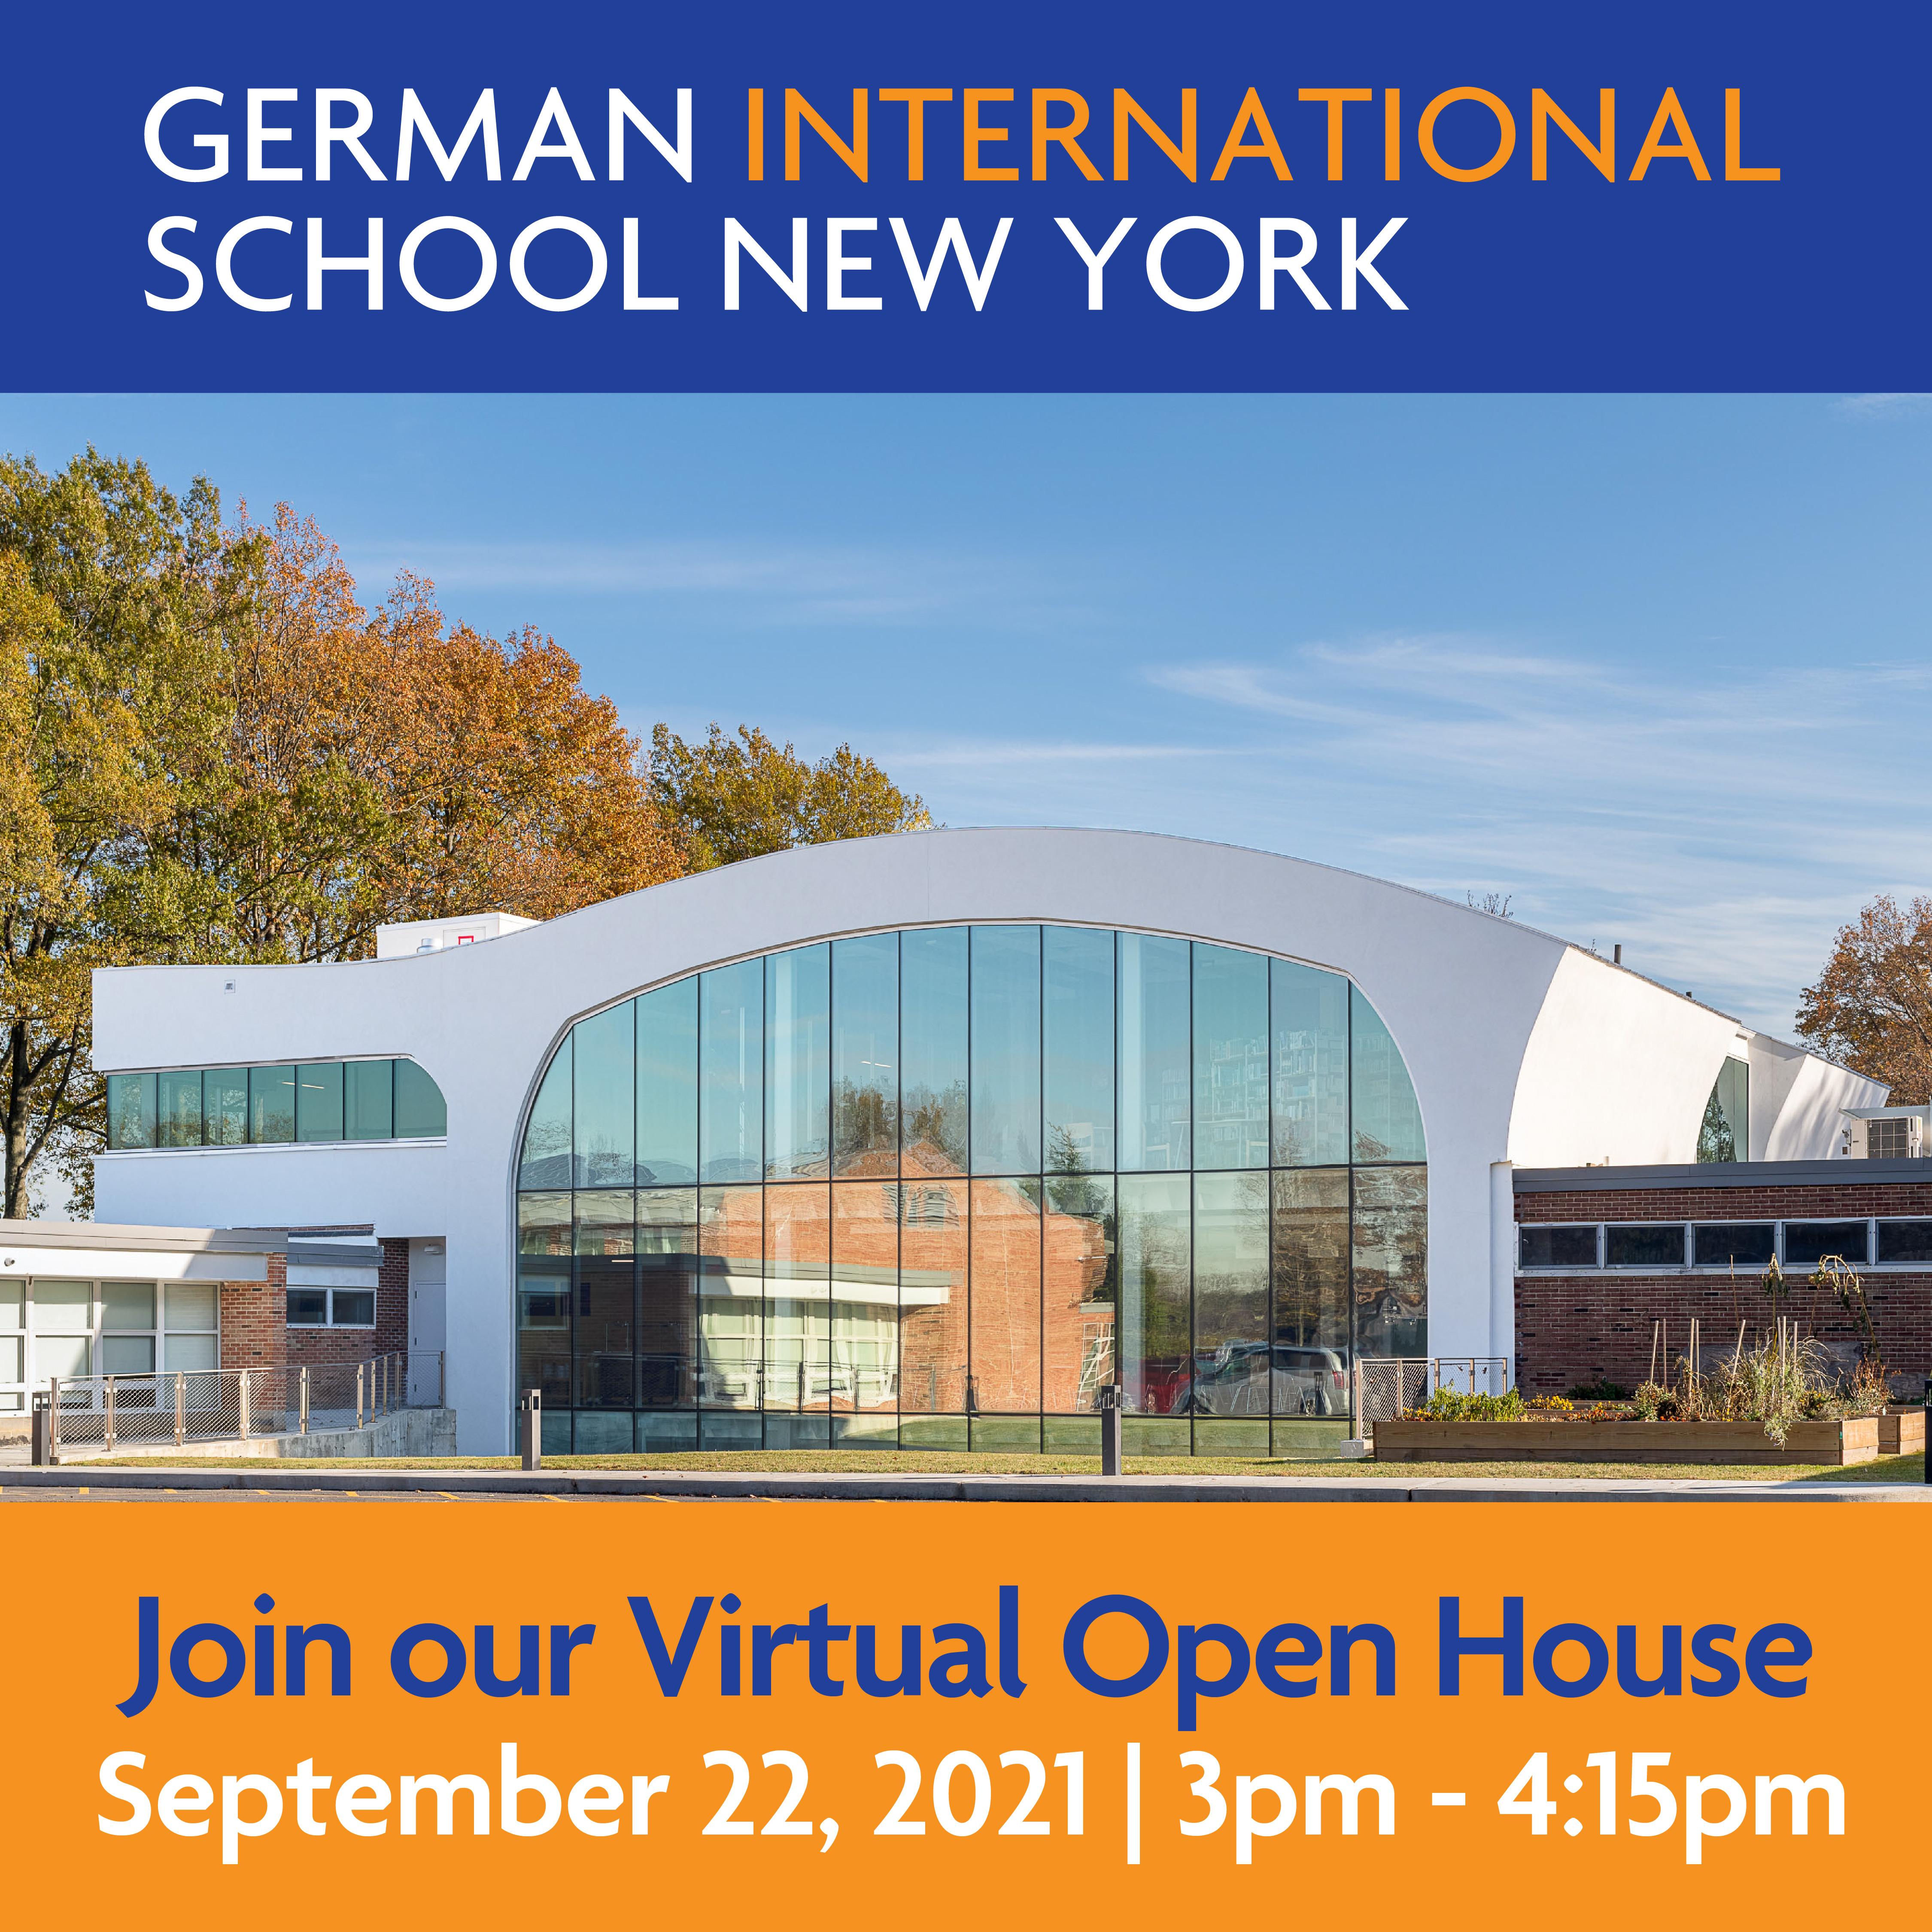 Virtual Open House at German International School New York